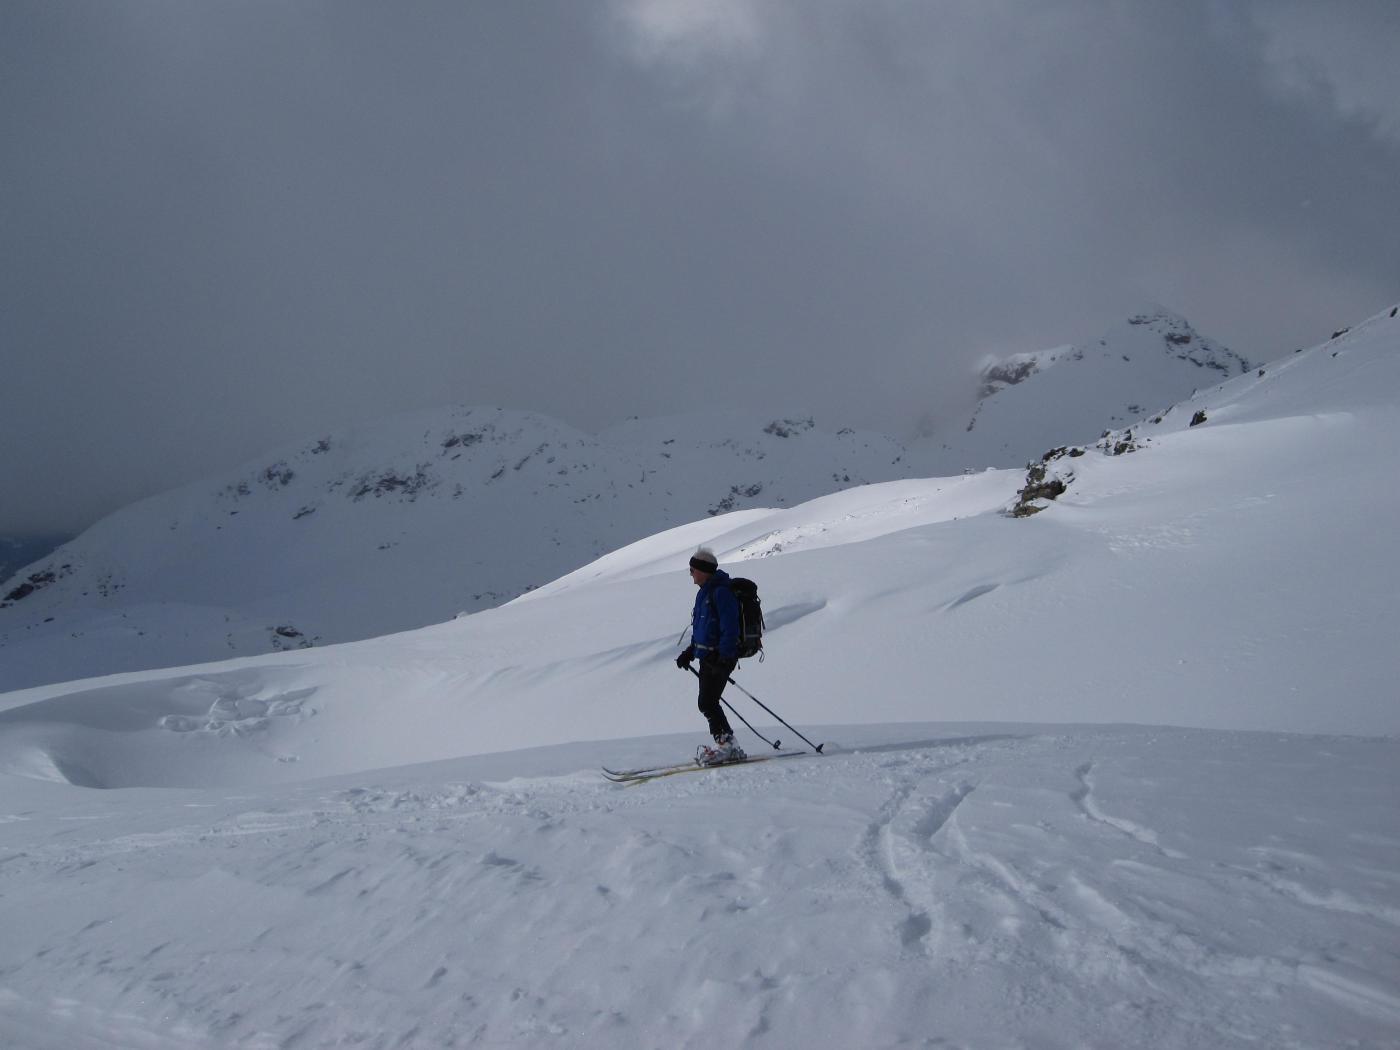 poco sopra l'alpe Palasinaz